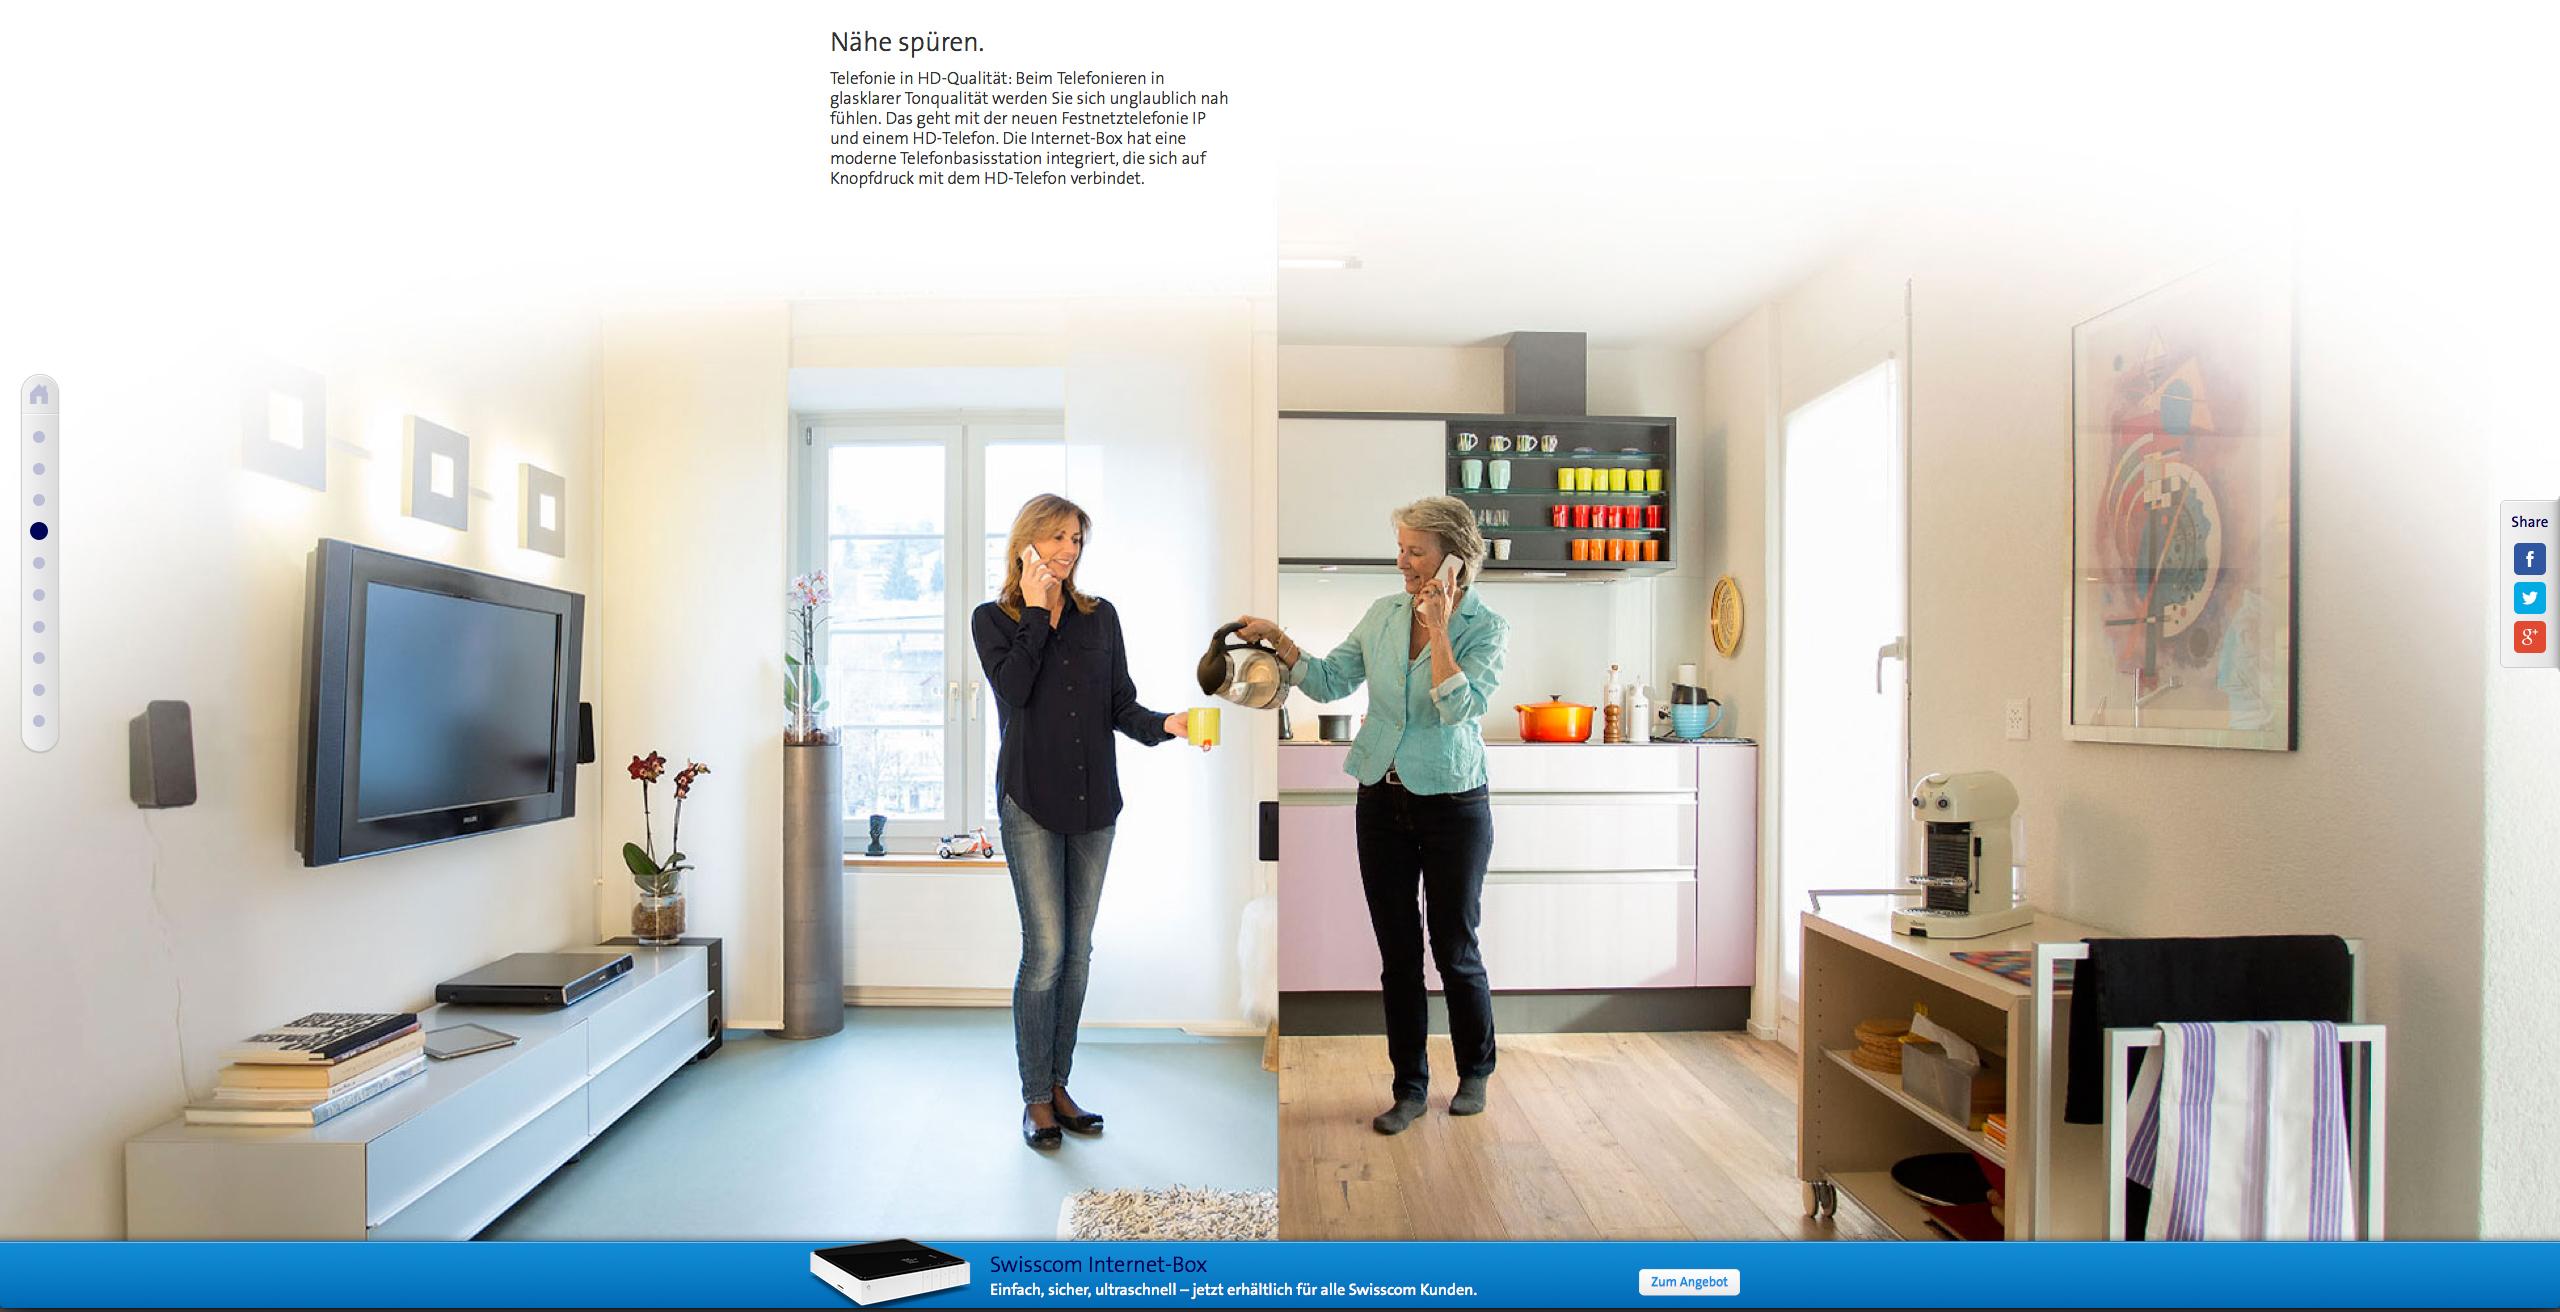 emmerlingphoto - Swisscom Internetbox